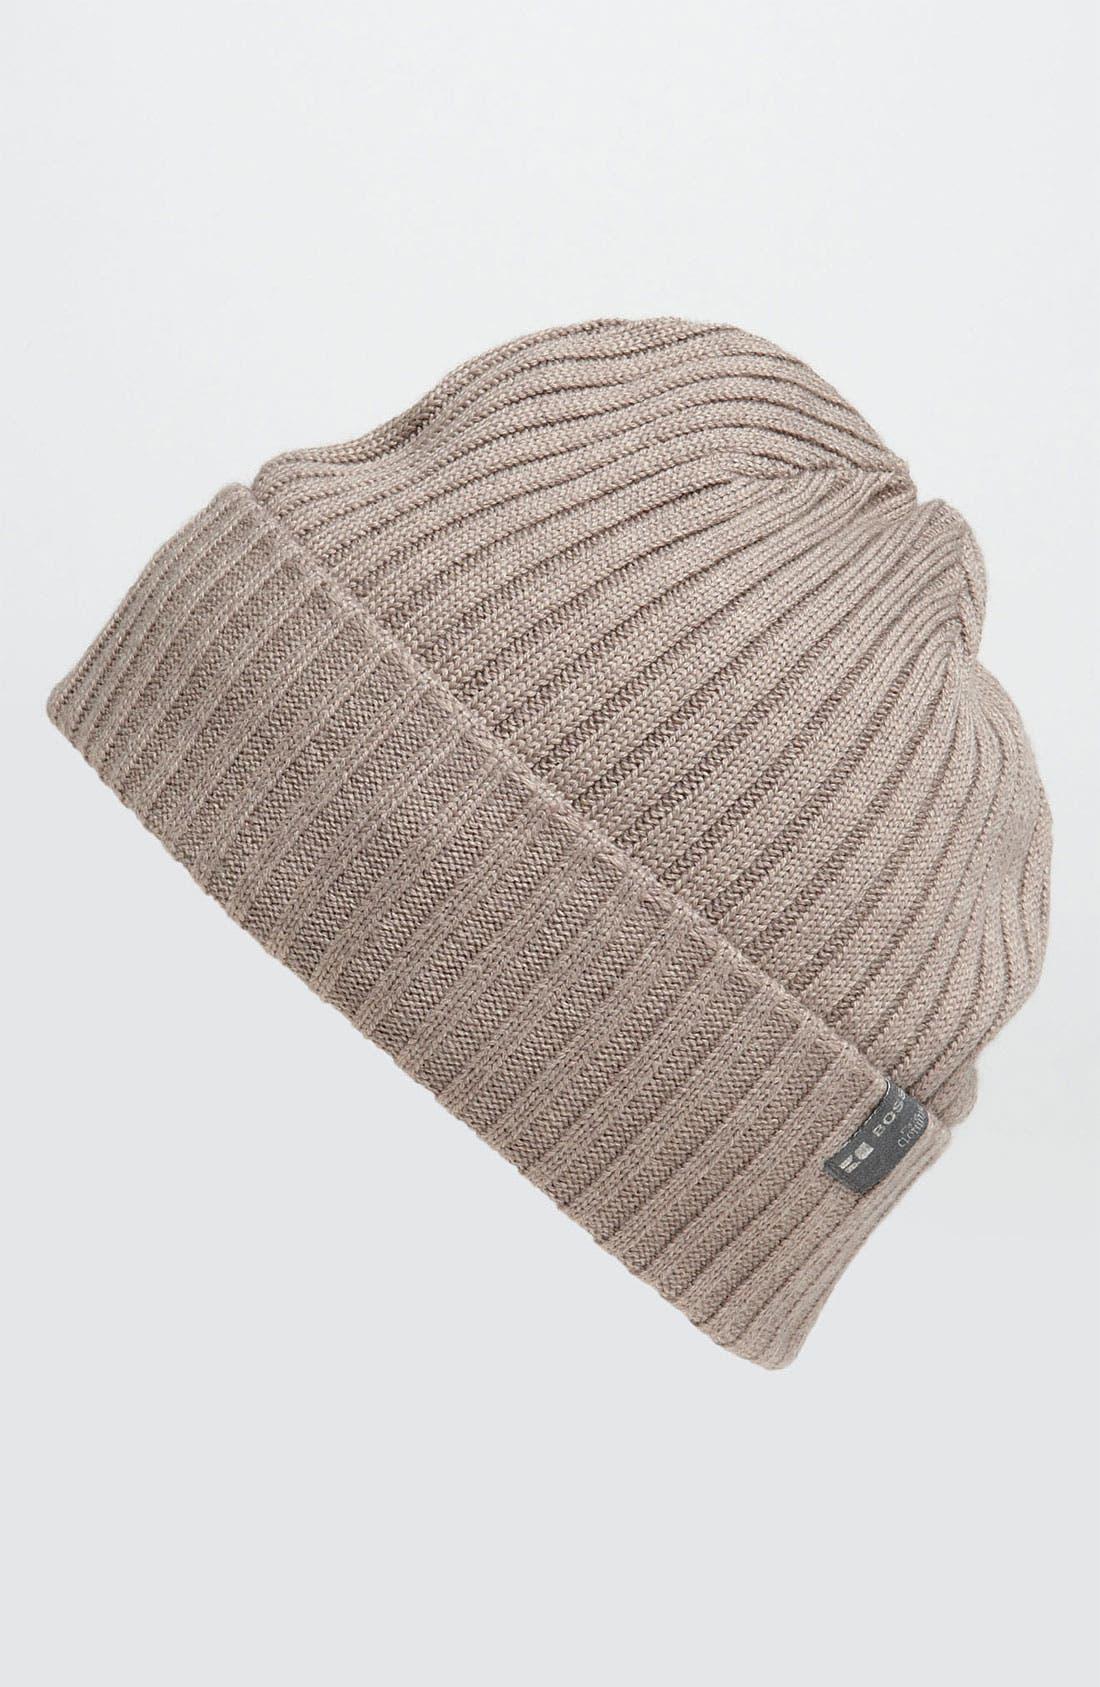 Alternate Image 1 Selected - BOSS Orange Wool Blend Knit Cap